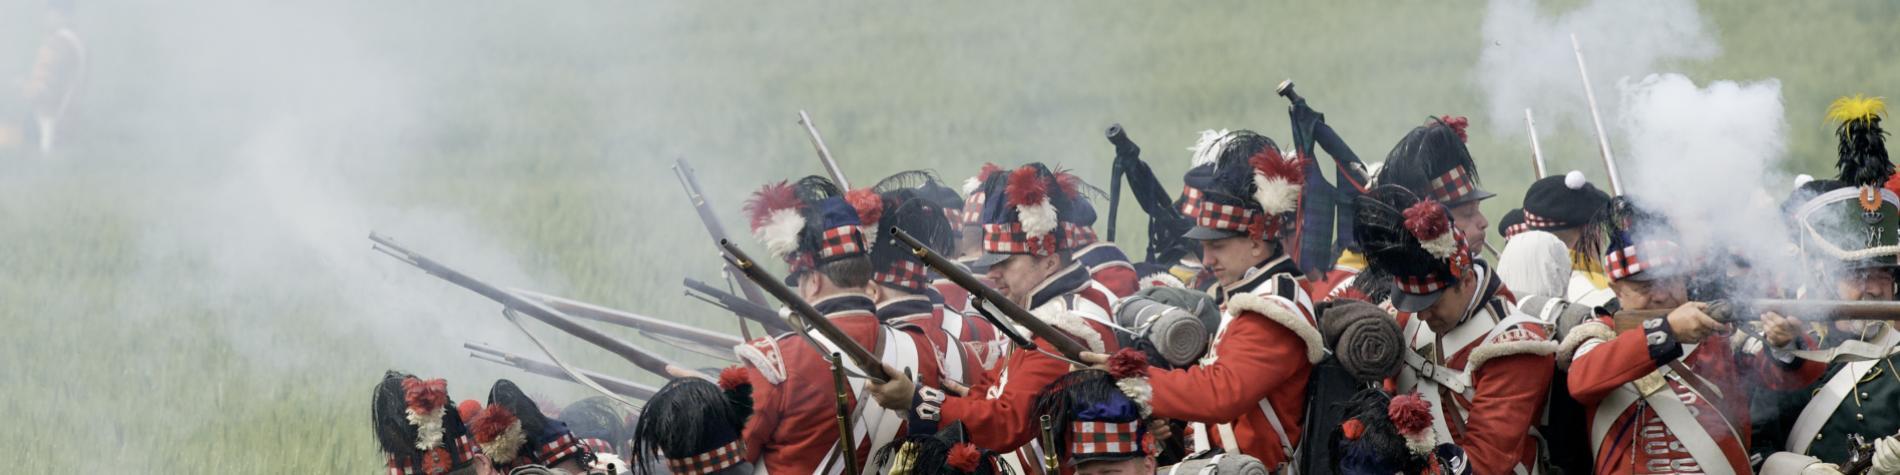 Commémoration - Bataille - Waterloo - reconstitution